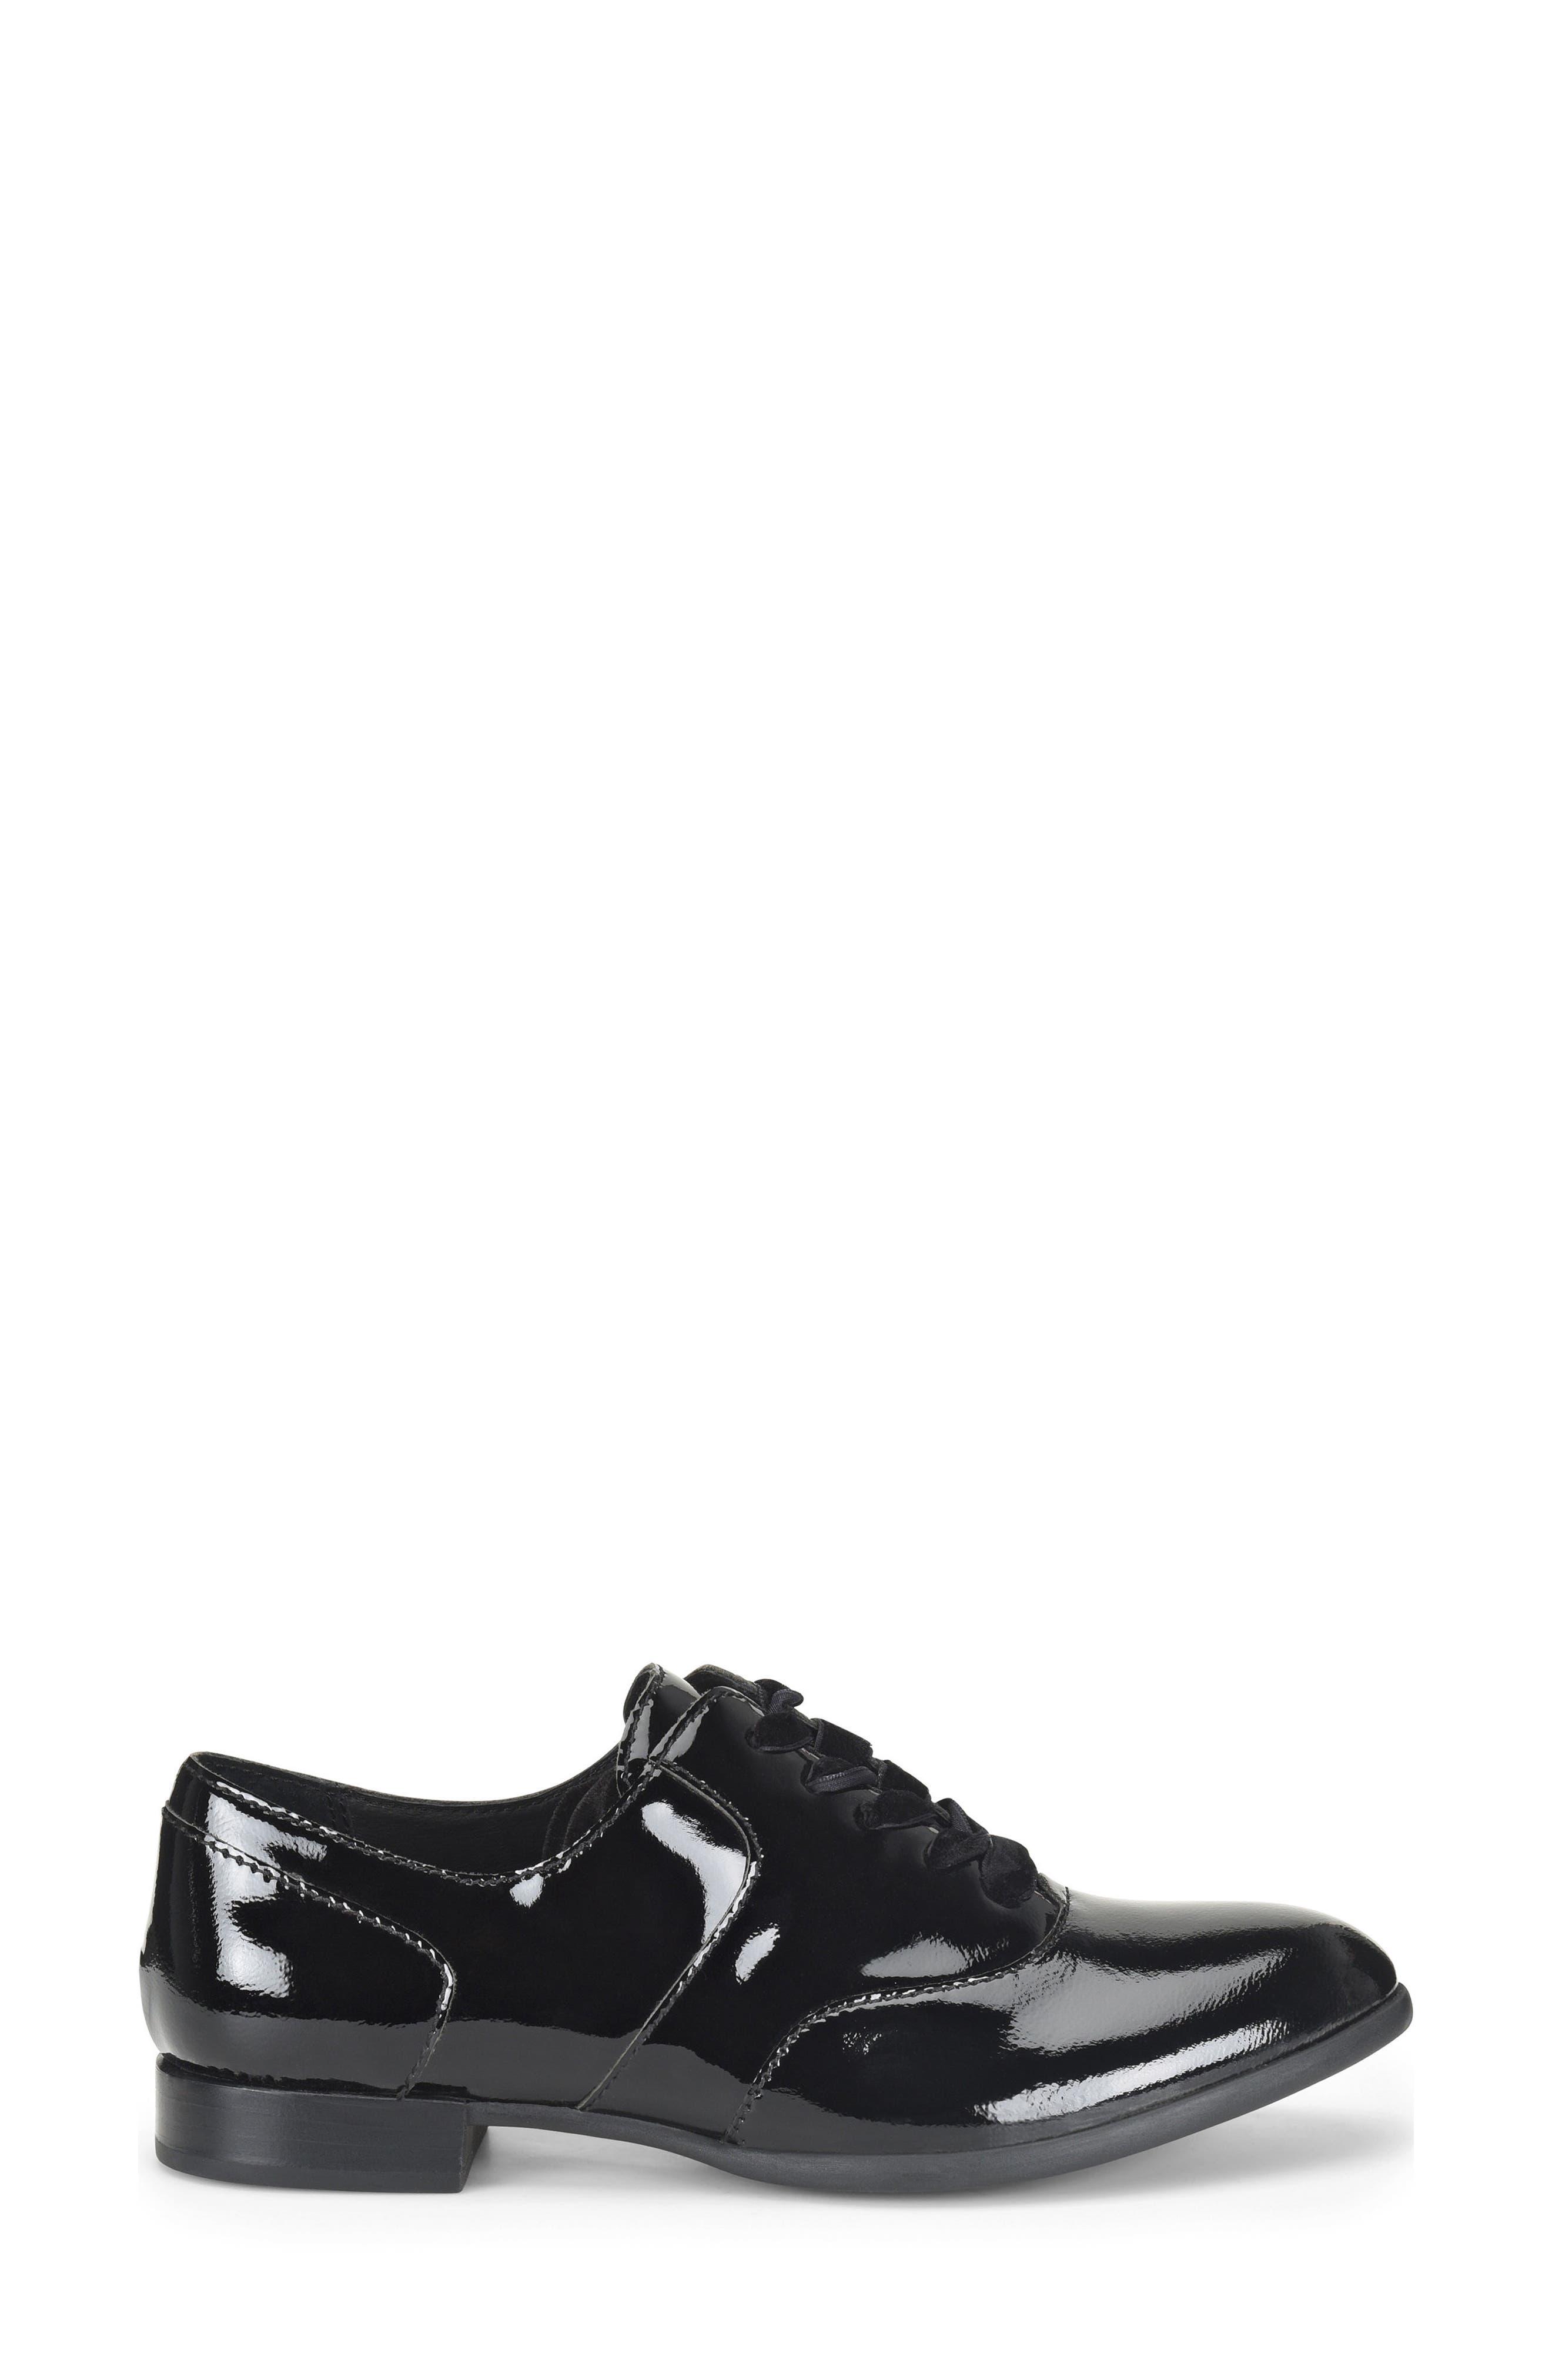 Eden Flat,                             Alternate thumbnail 3, color,                             Black Patent Leather